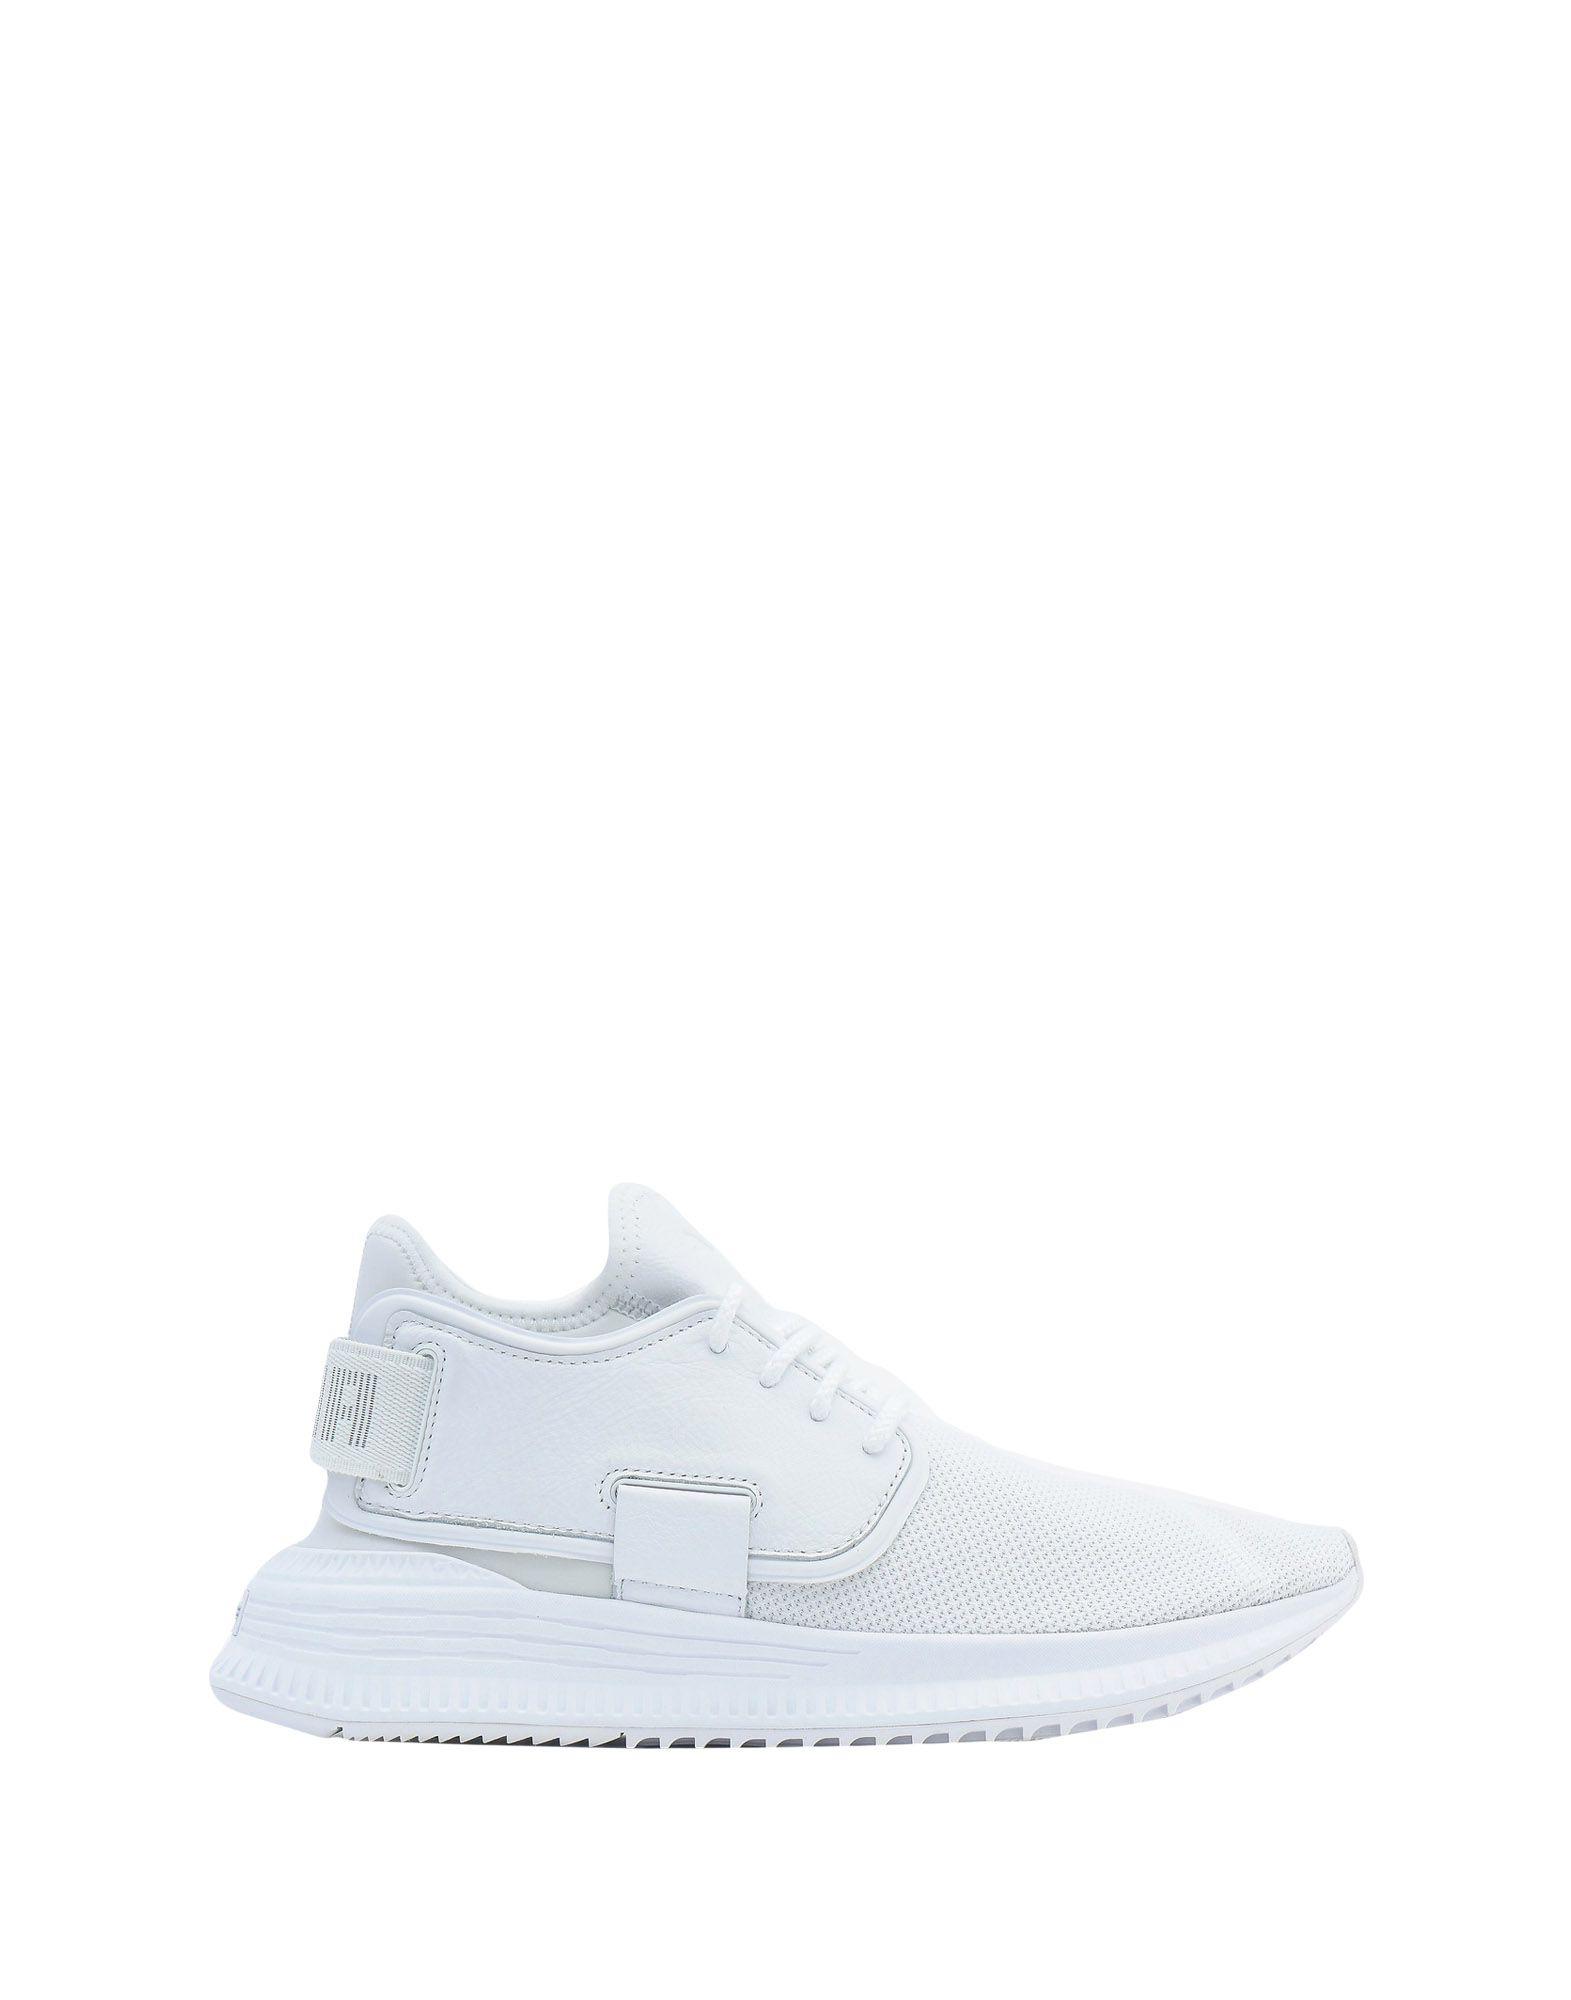 Puma Tsugi-Mi Monolith - - - Sneakers - Women Puma Sneakers online on  Canada - 11490054FG cc52a4